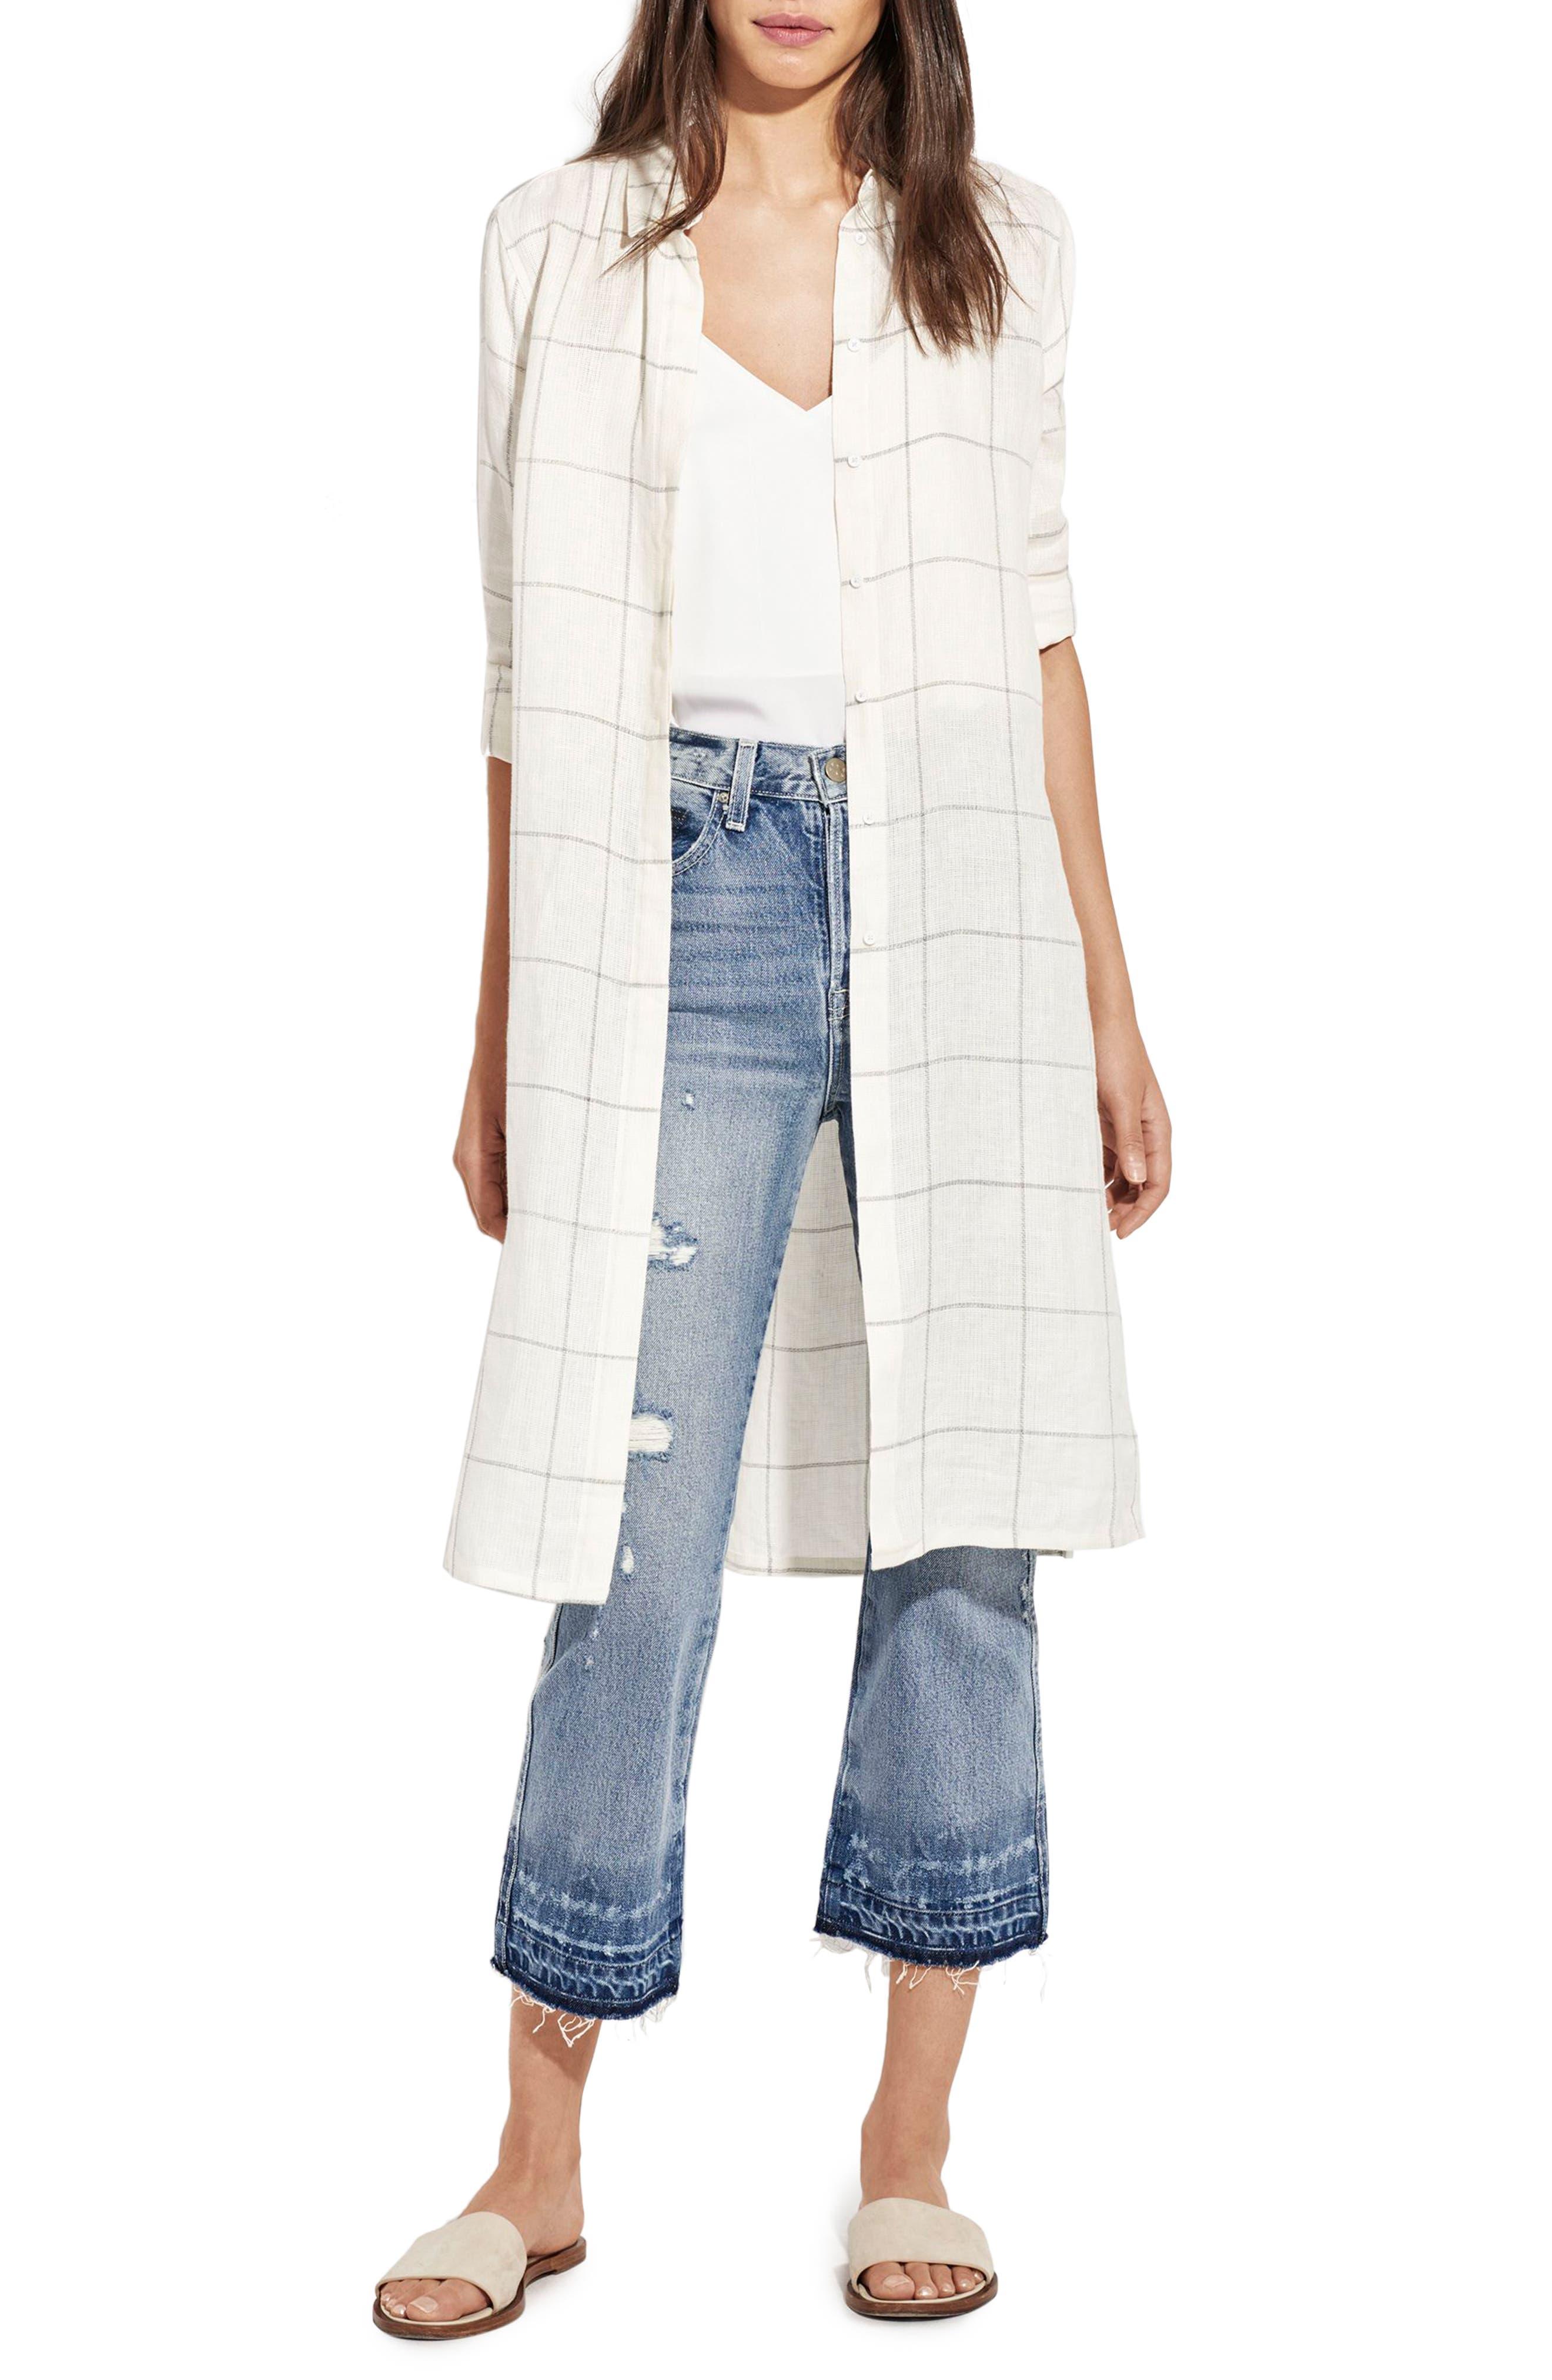 AYR The Winx Linen Jacket